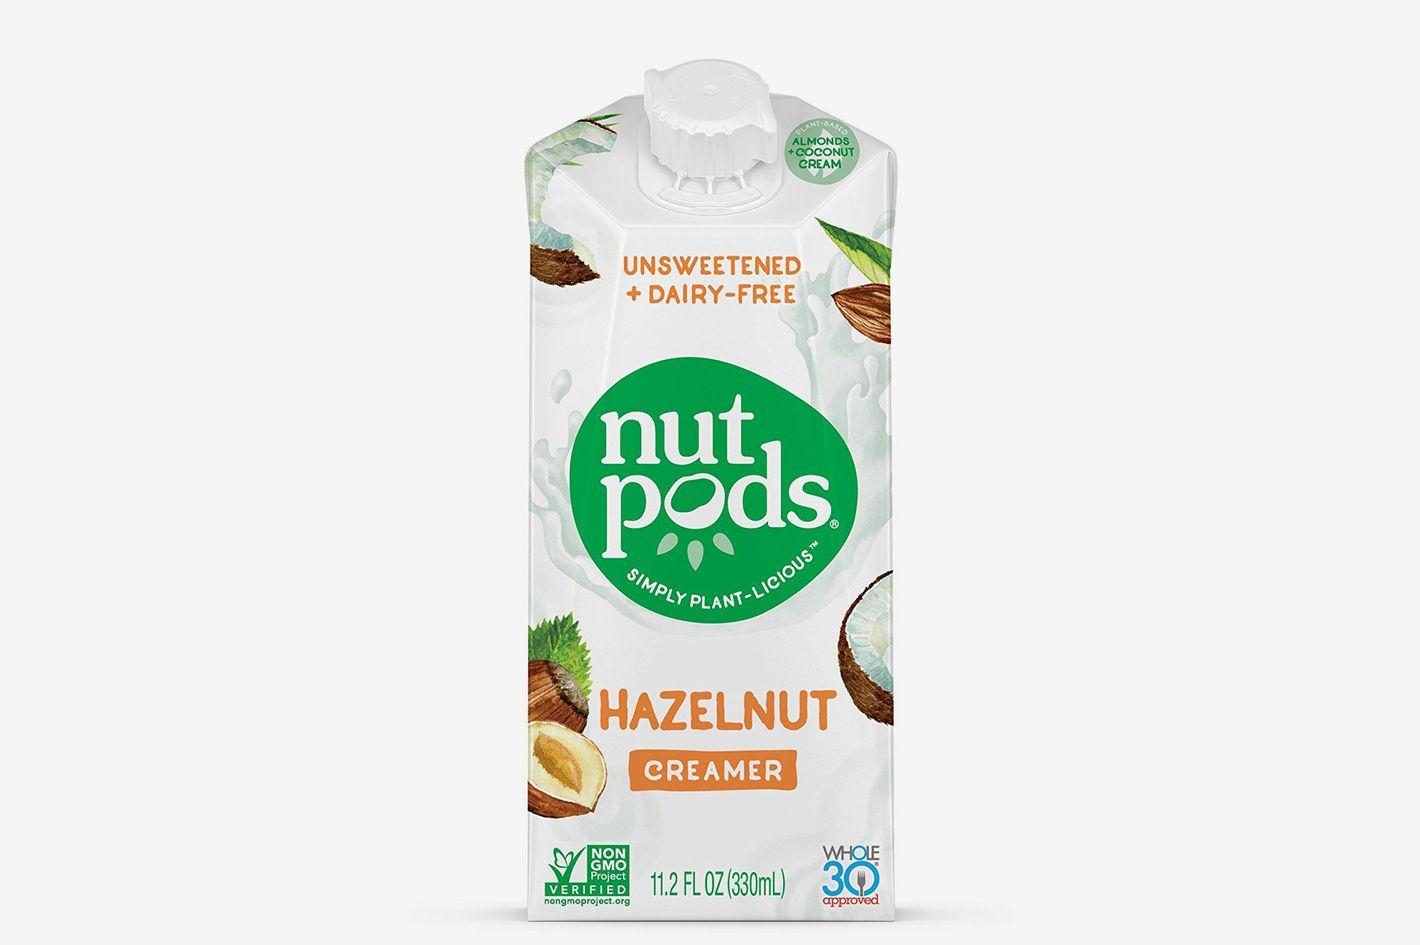 Nutpods Dairy-Free Creamer Unsweetened (Hazelnut, 4-pack)